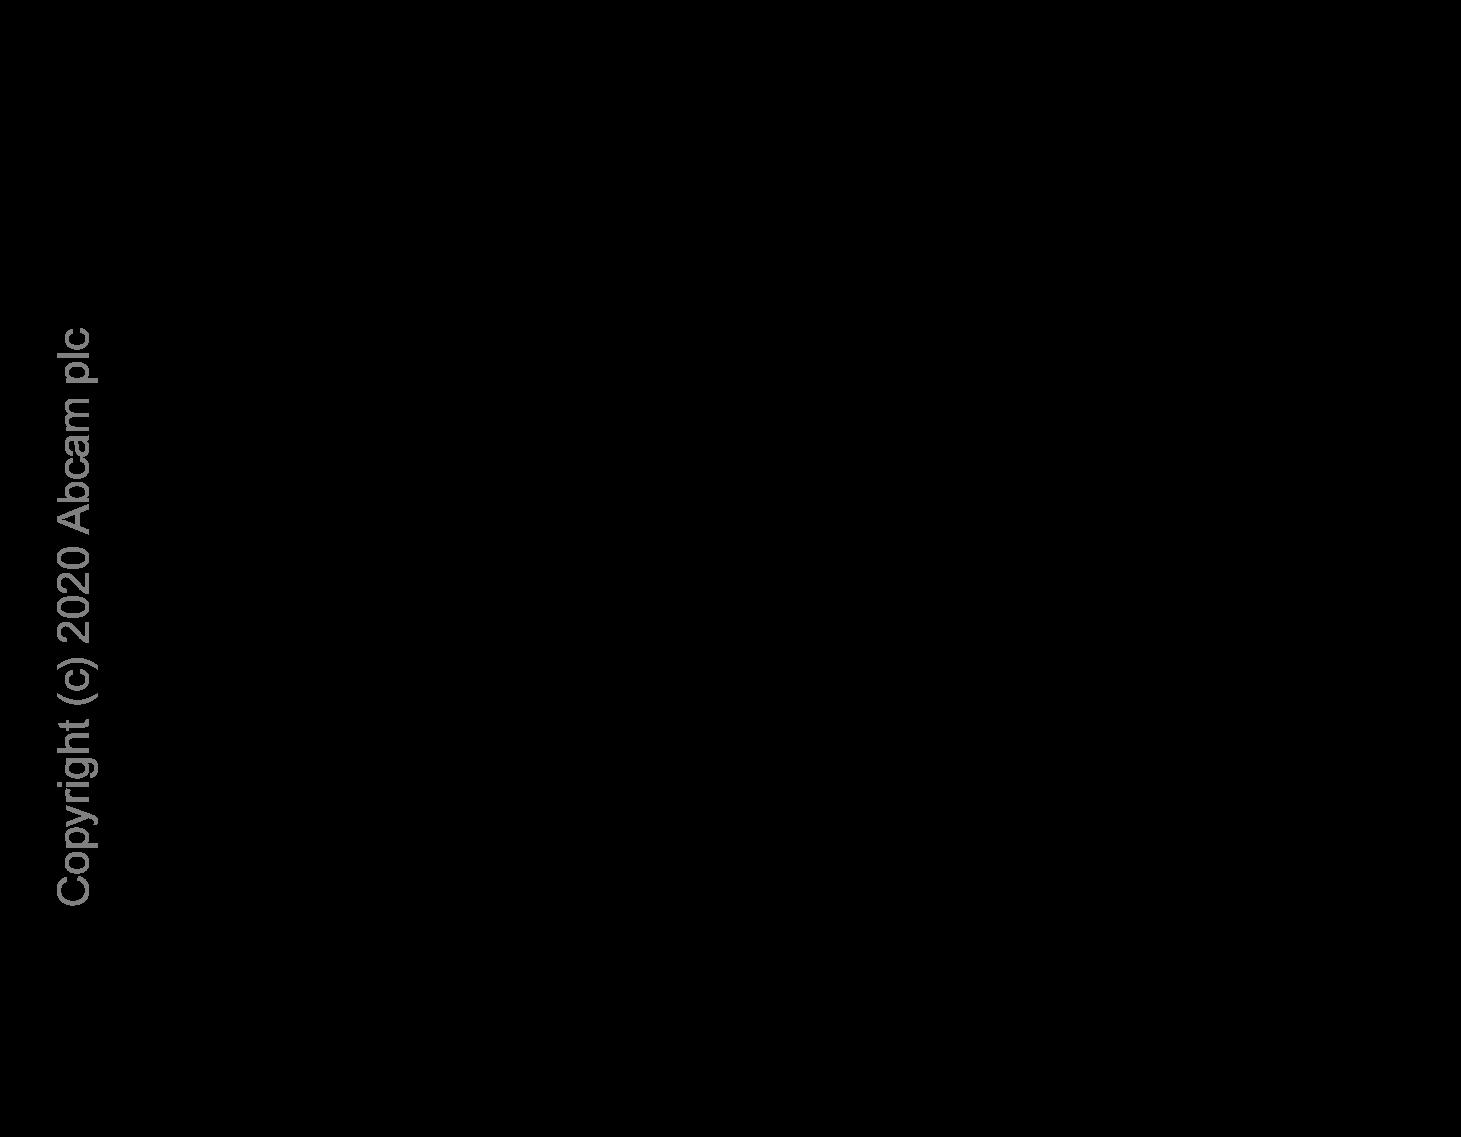 ELISA - Anti-IP10 antibody [EPR20764] (ab214668)